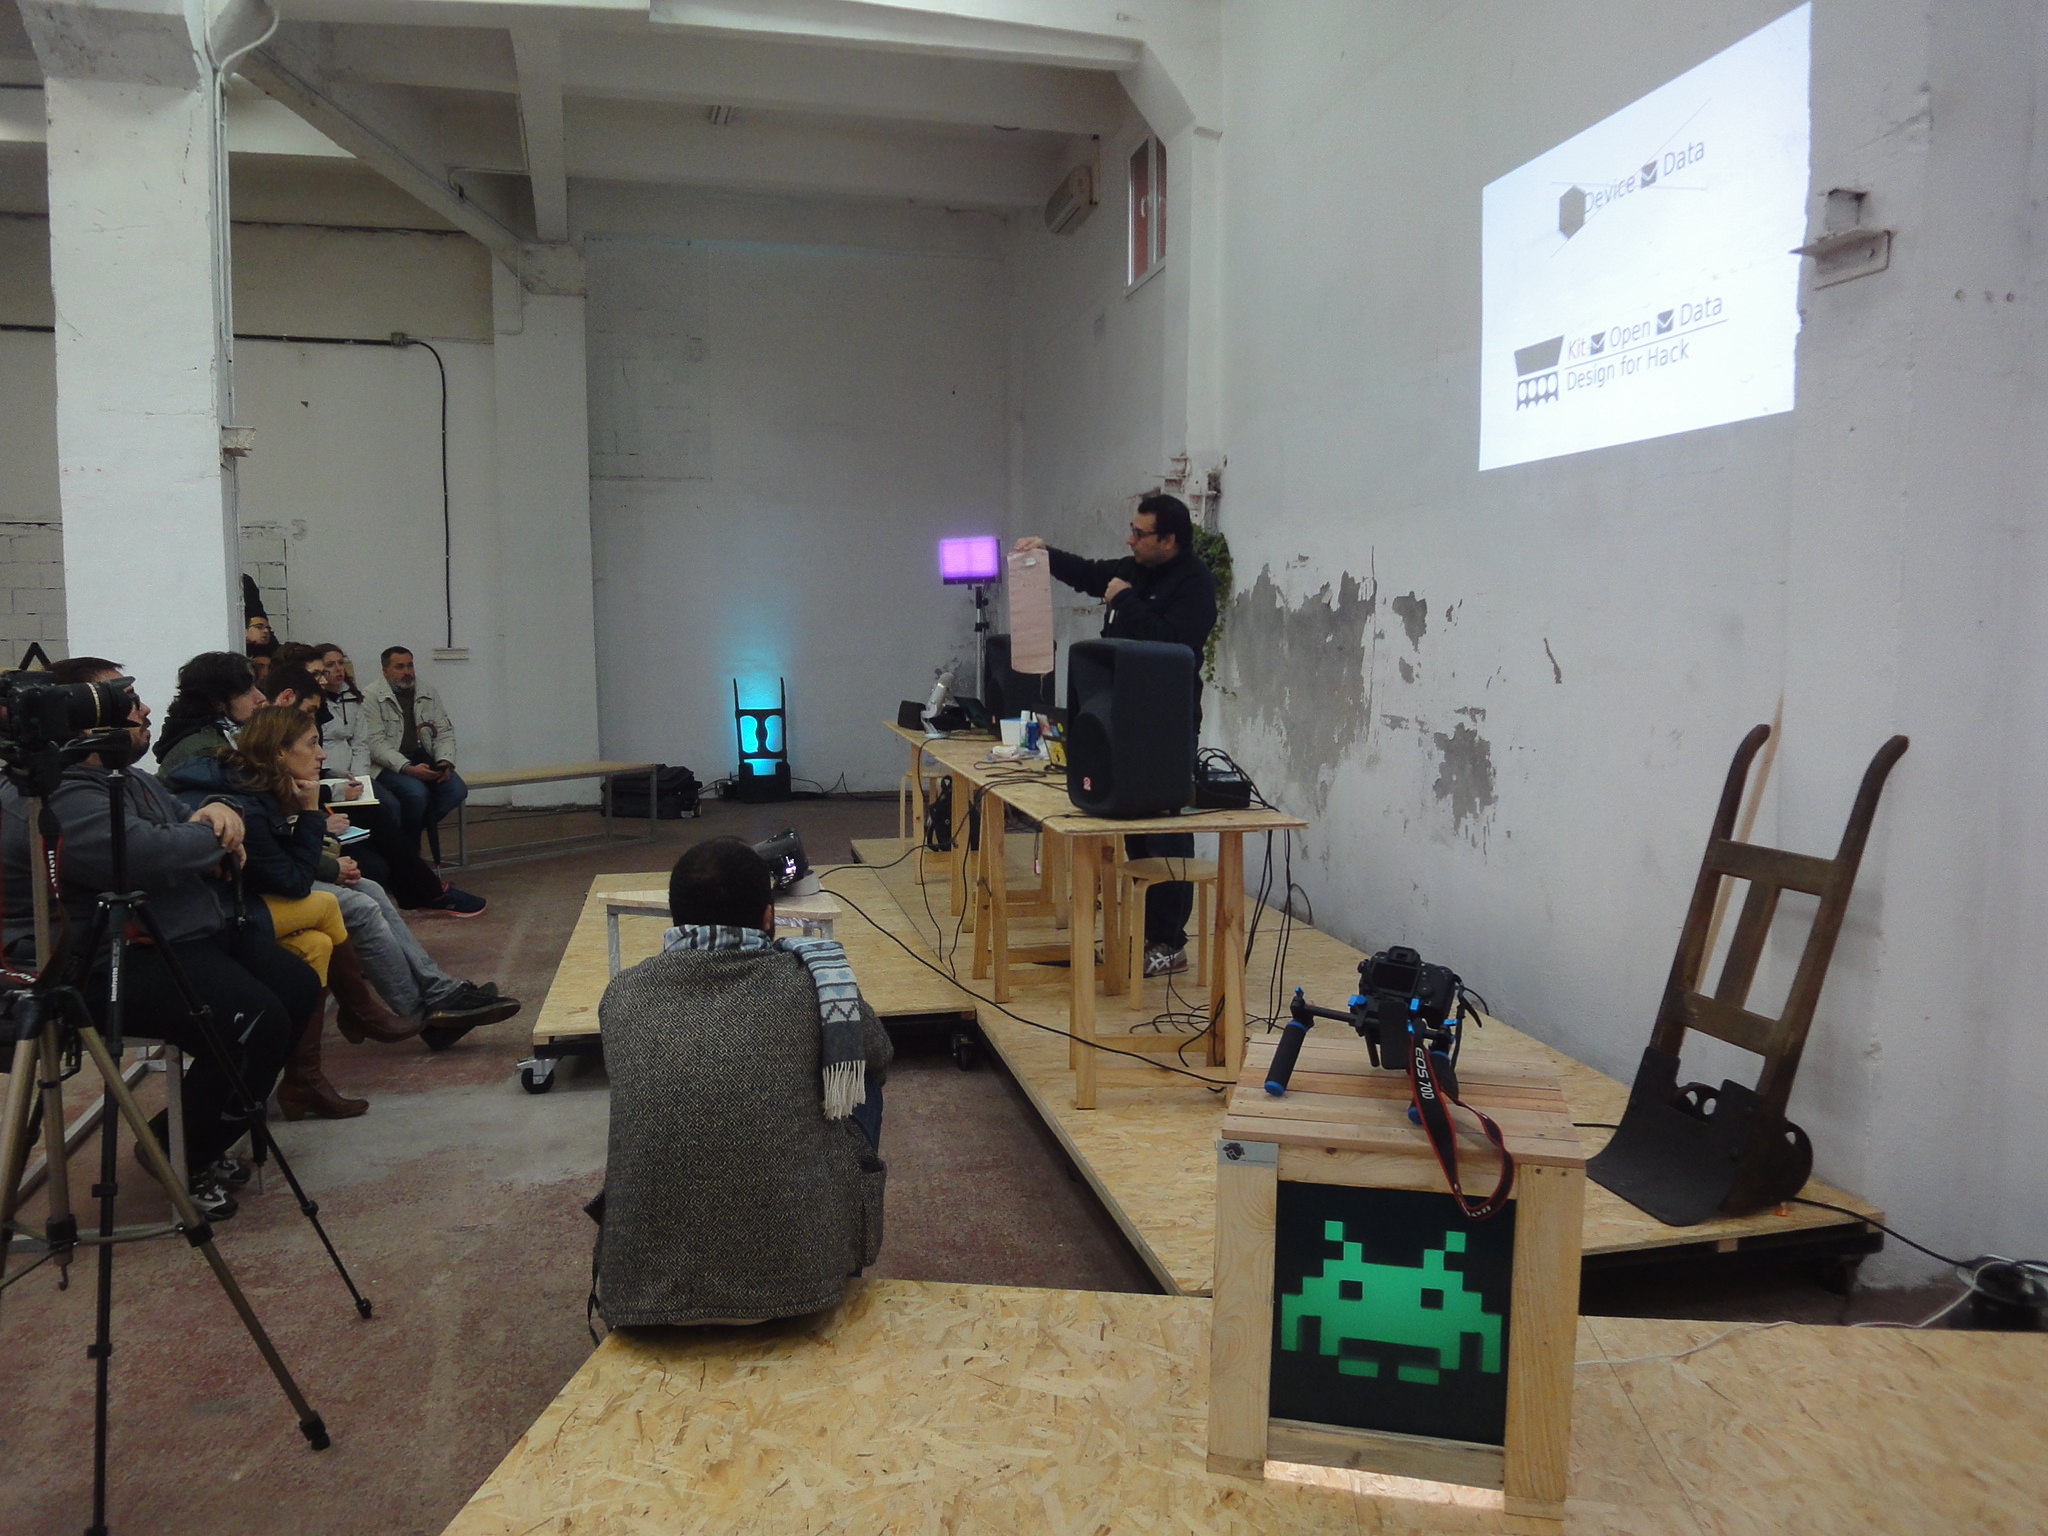 Presentacion Jose Marquez Maker Faire Bilbao